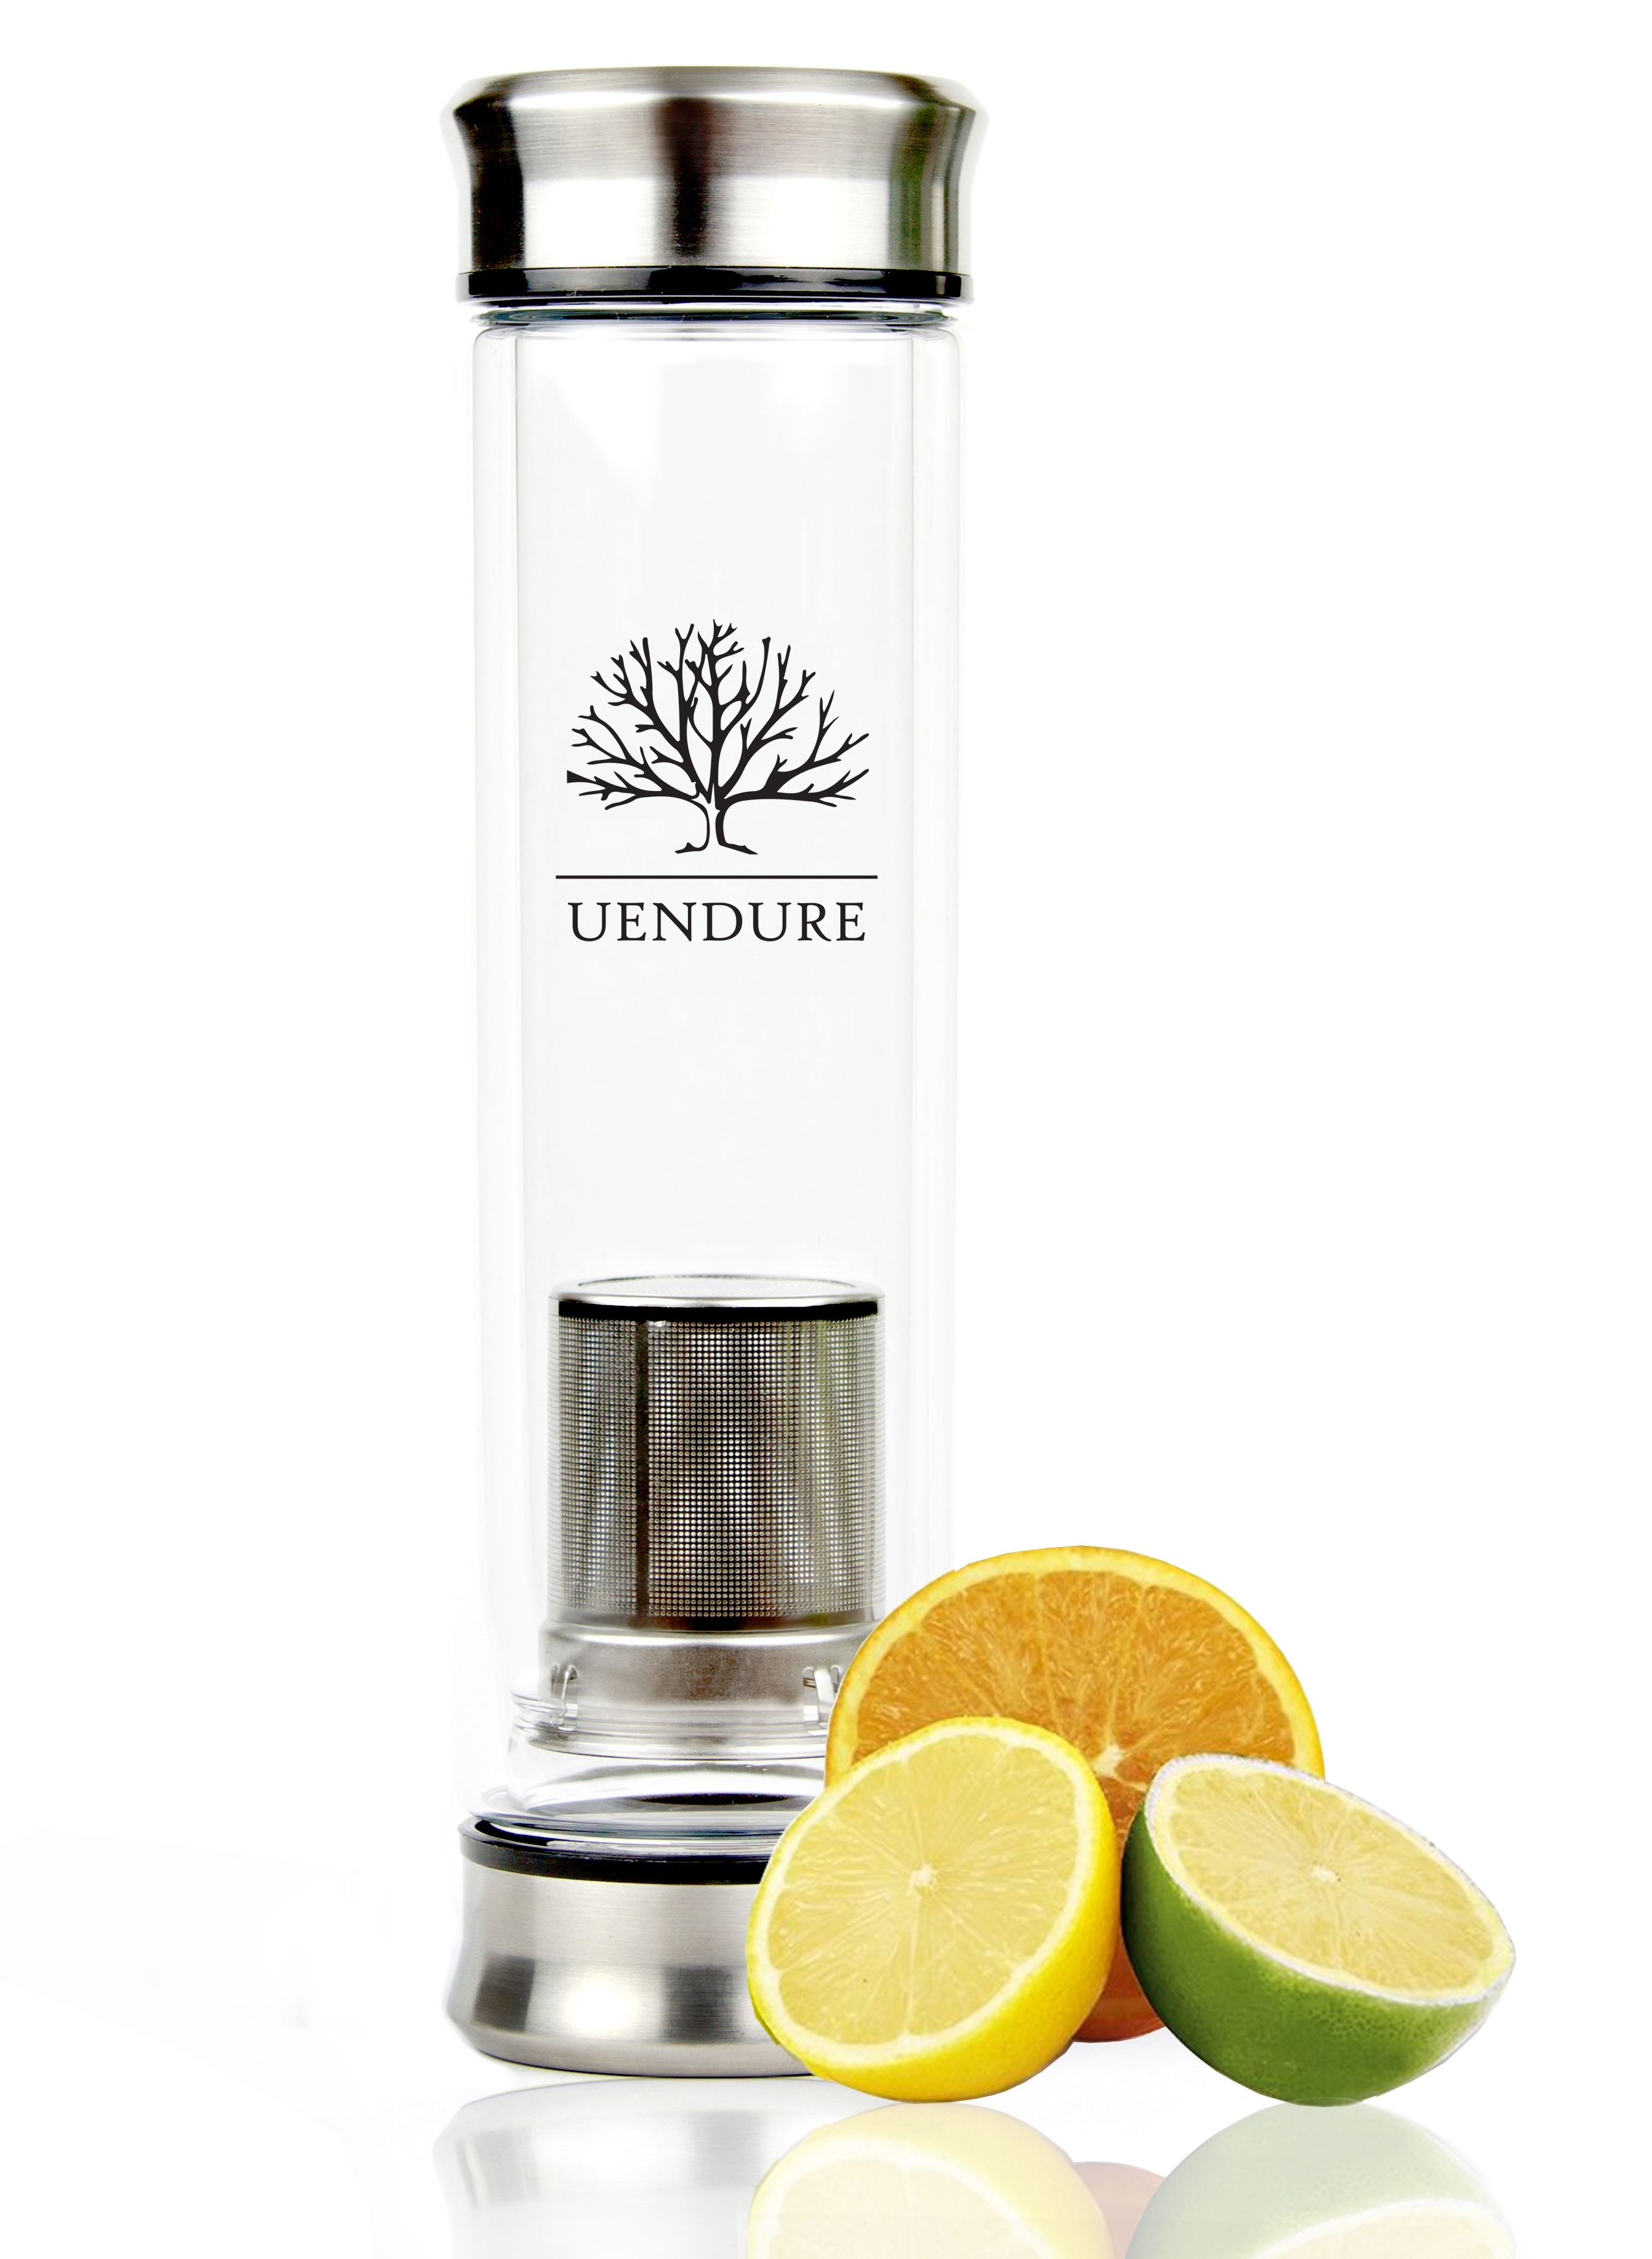 Skinny Tea Tumbler Glass Water Bottle - Loose Leaf Tea Cup and Fruit Infuser - 15oz Travel Mug http://www.amazon.com/Skinny-Tumbler-Glass-Water-Bottle/dp/B00TNDCK80/ref=sr_1_17?s=kitchen&ie=UTF8&qid=1446755946&sr=1-17&keywords=tea+tumbler $28.99